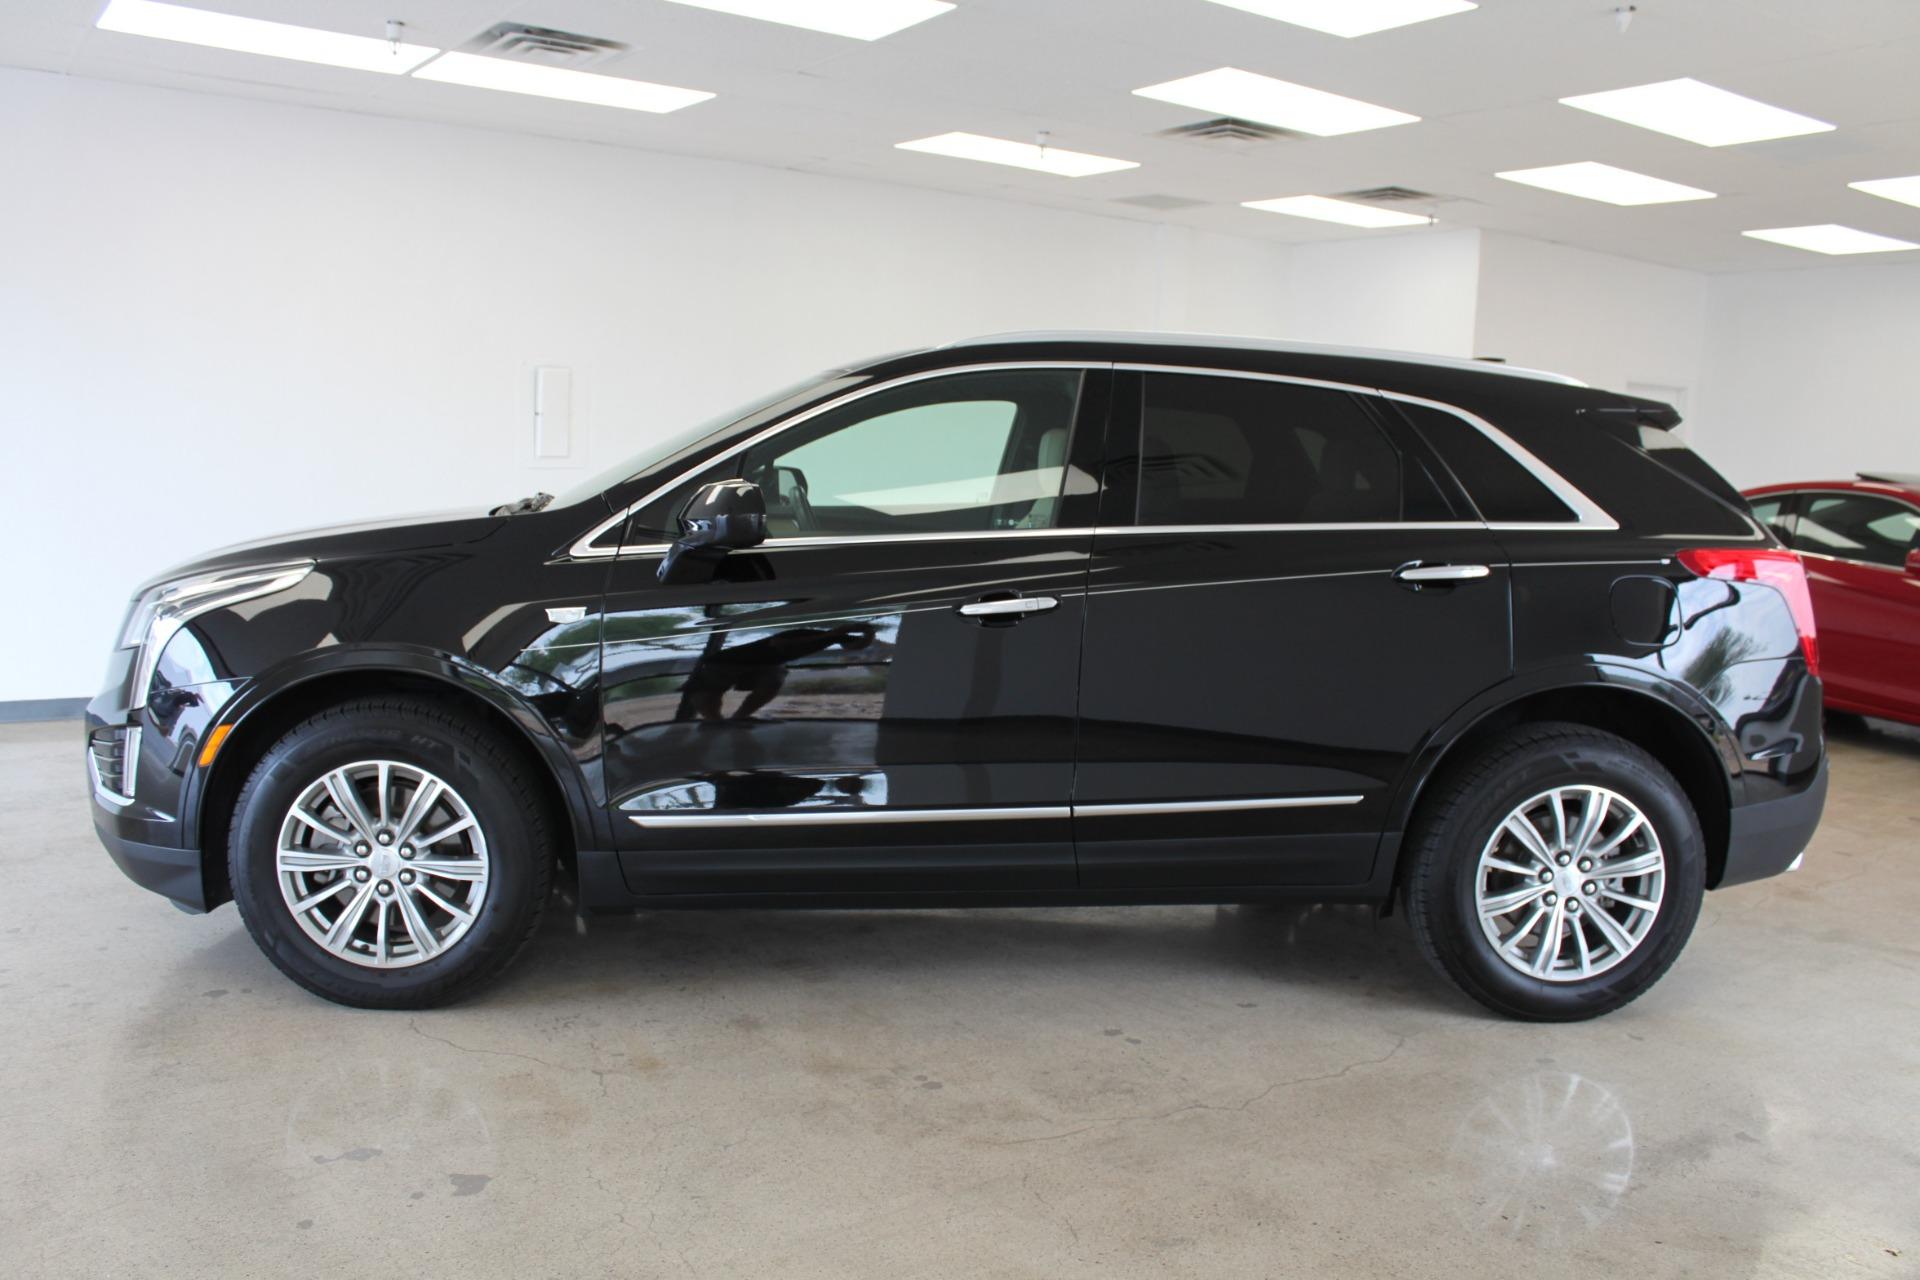 Used-2017-Cadillac-XT5-Luxury-All-Wheel-Drive-Luxury-AWD-Wagoneer